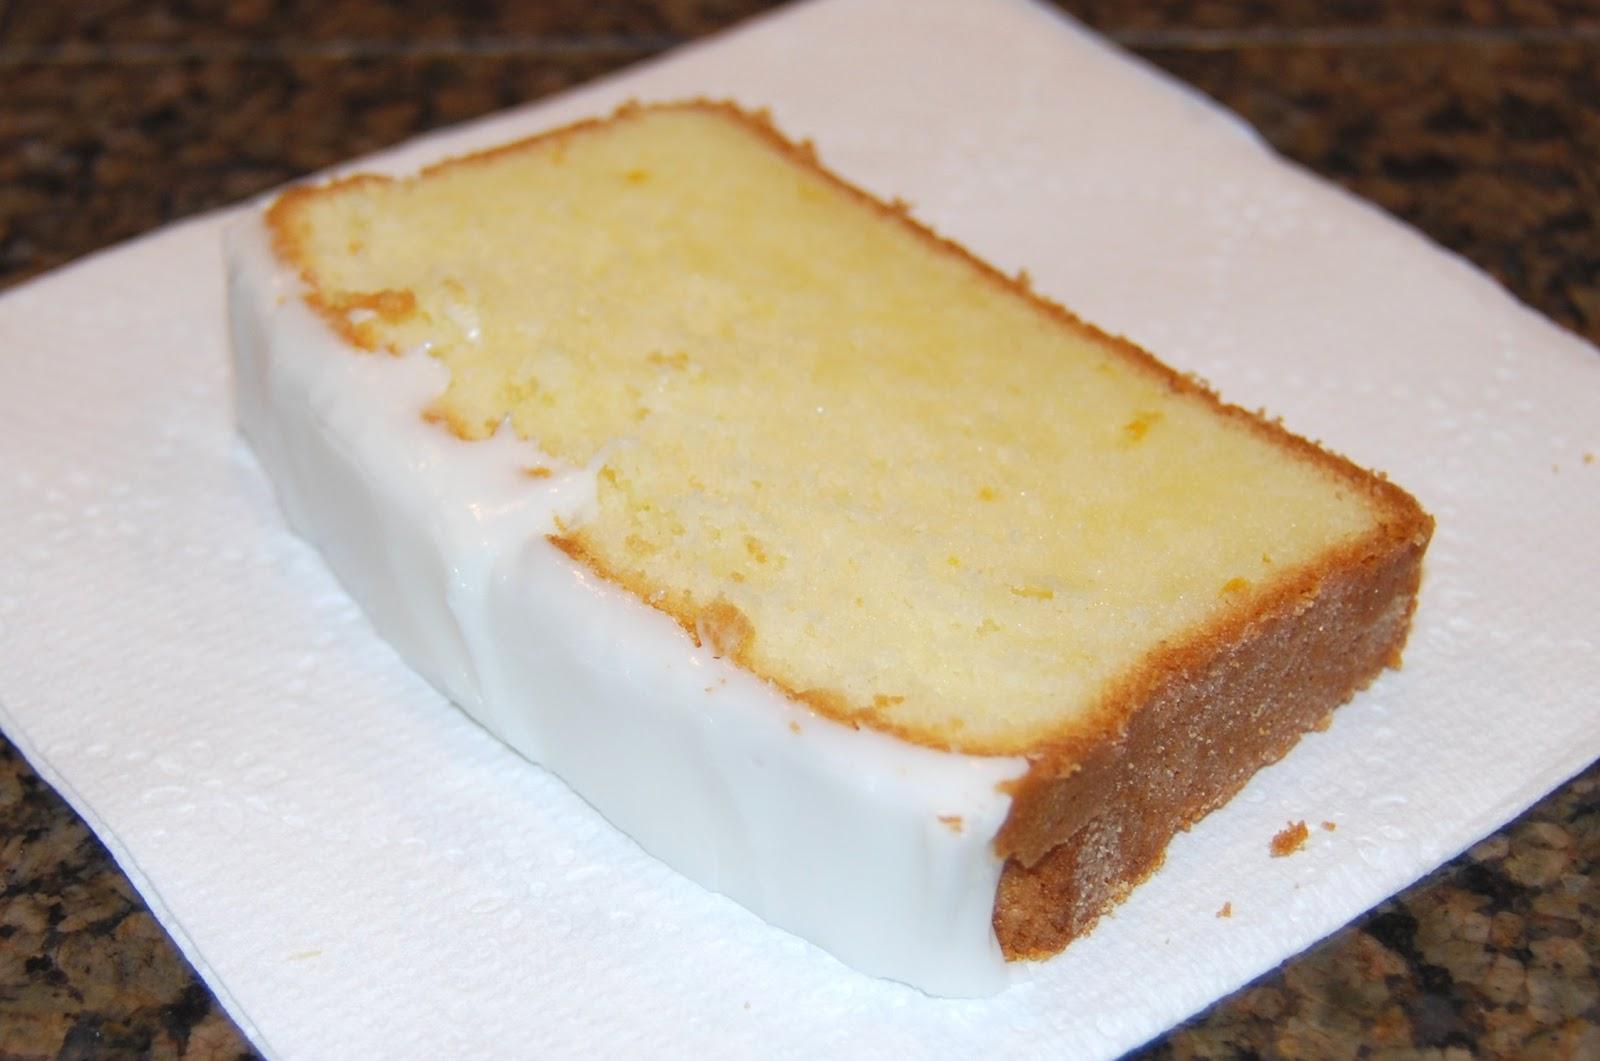 Starbucks' Iced Lemon Pound Cake | shinycopperpig